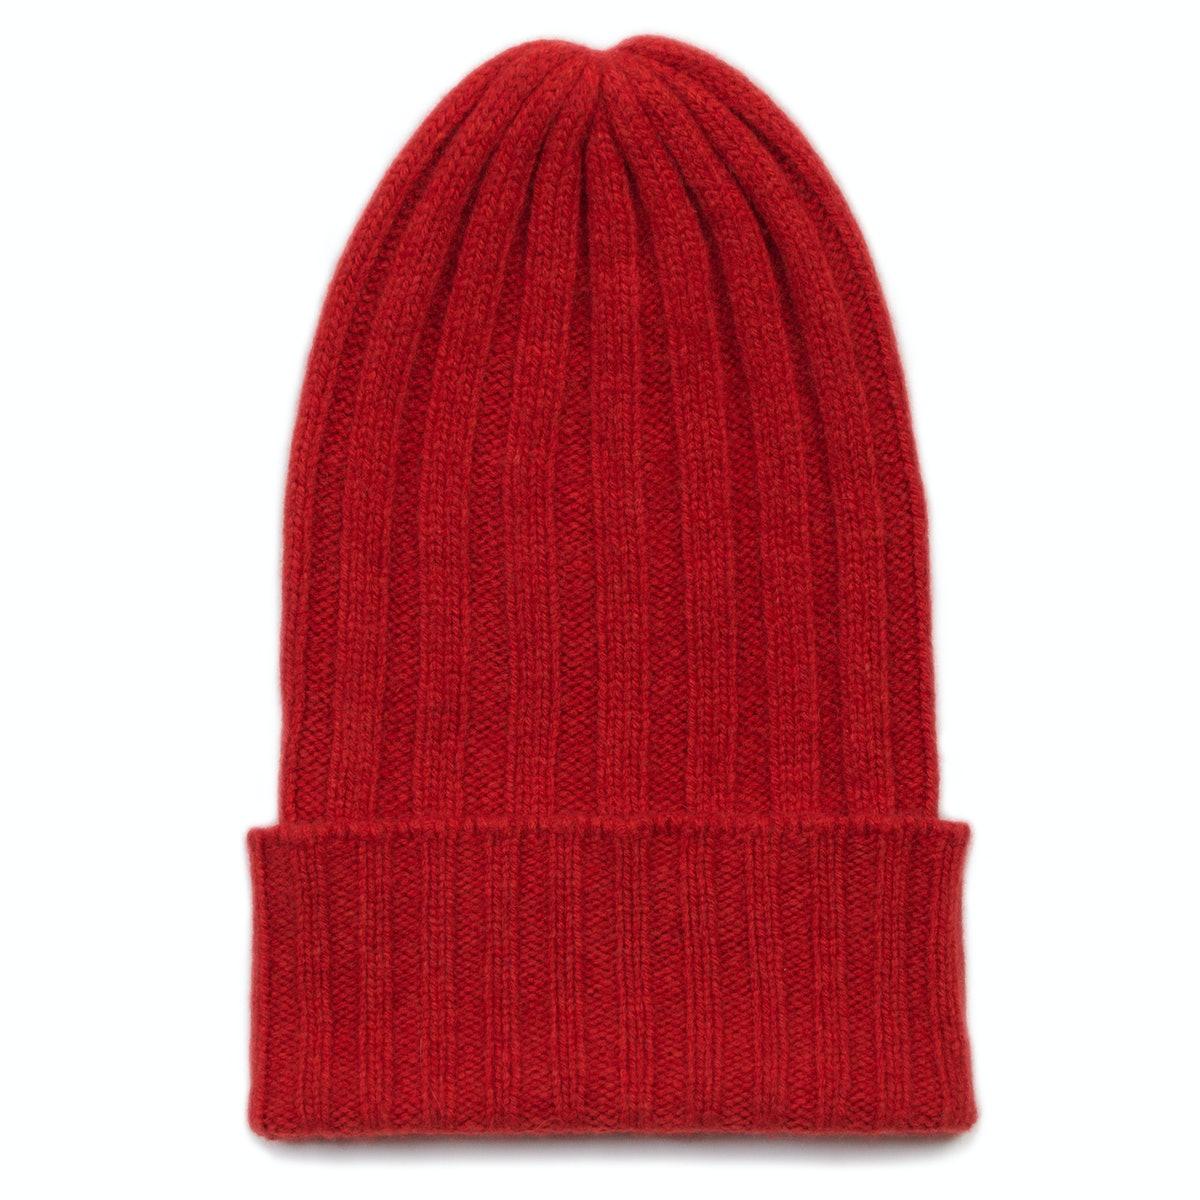 The Elder Statesman hat